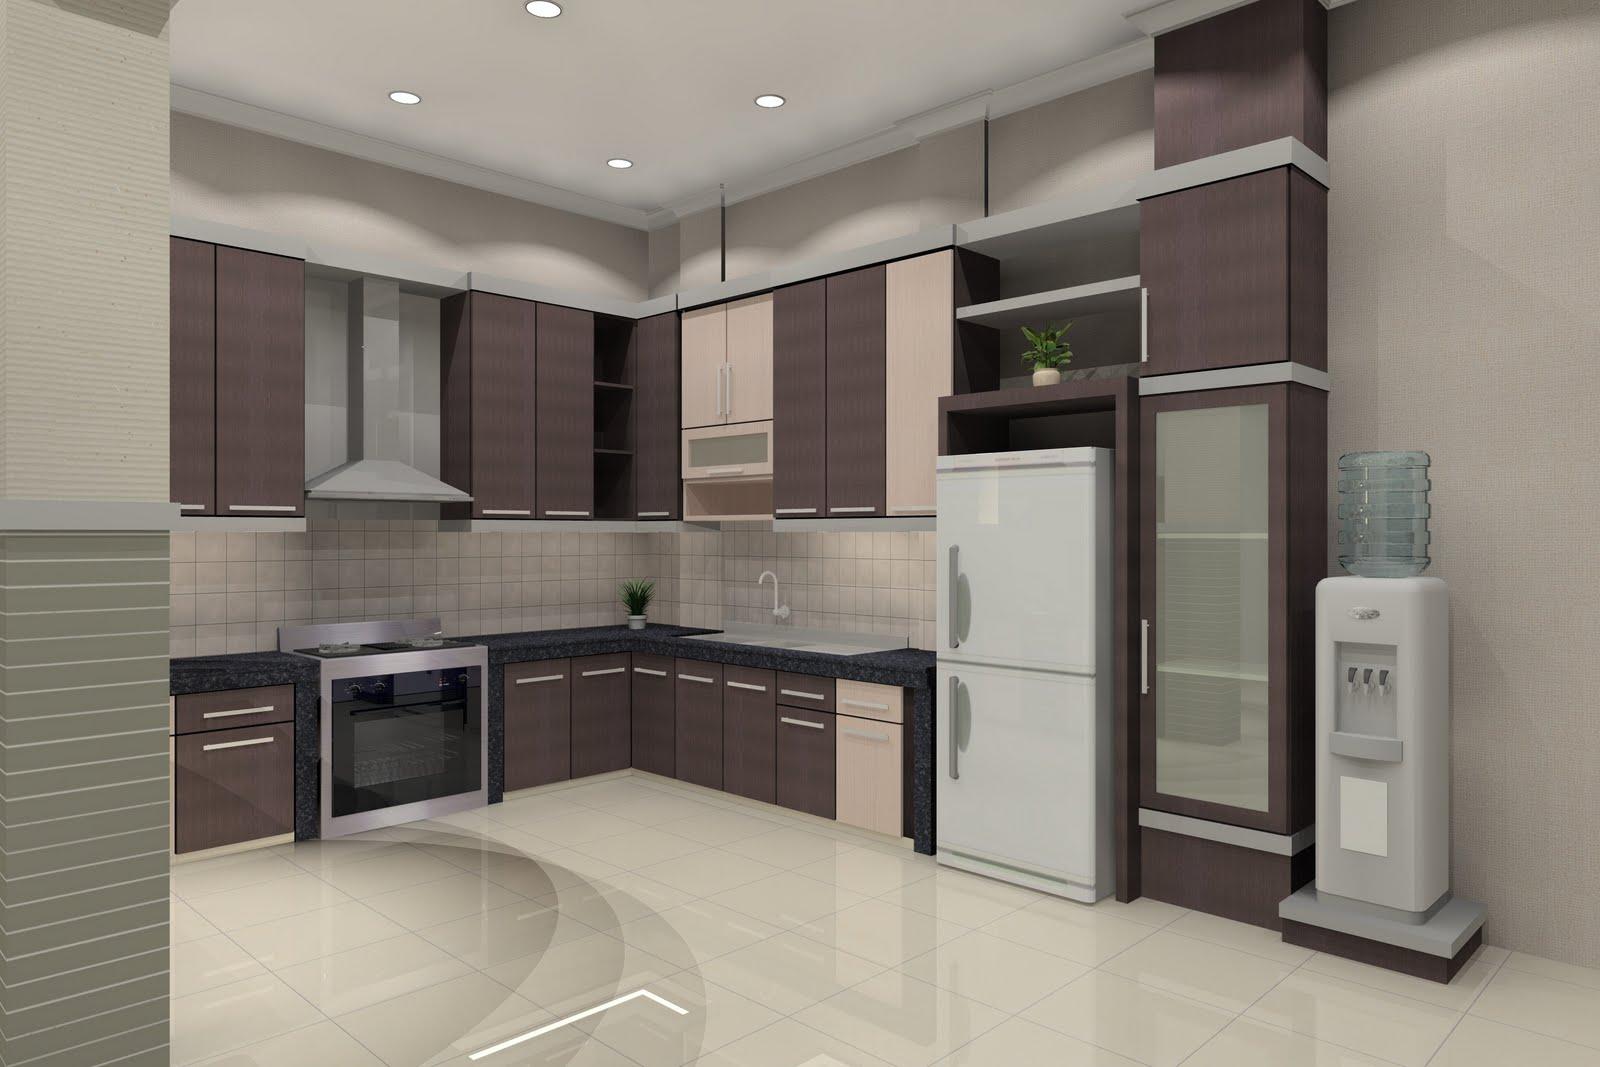 desain dapur minimalis modern kecil tapi cantik. Black Bedroom Furniture Sets. Home Design Ideas